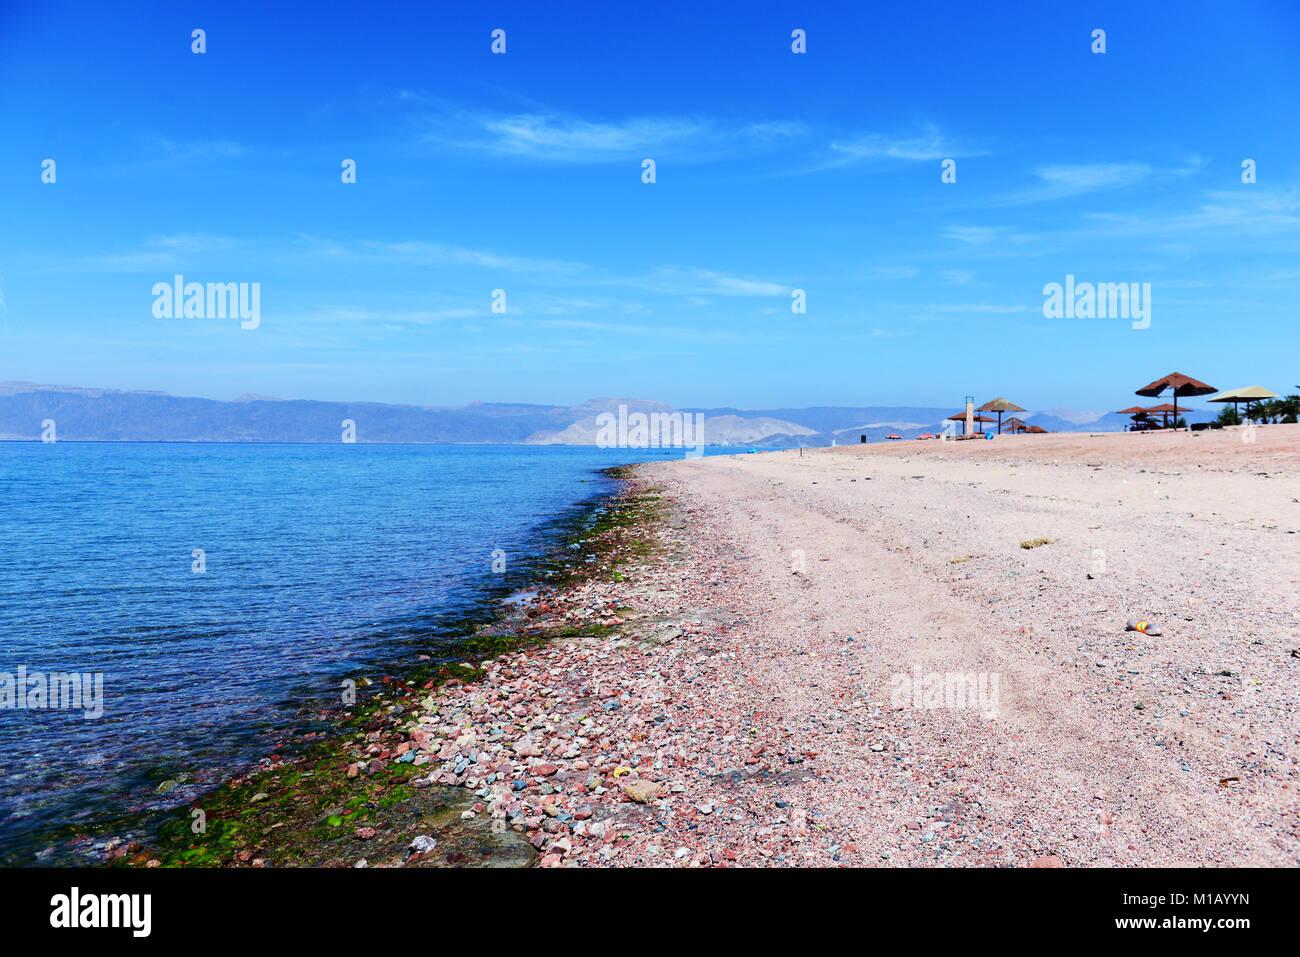 The beautiful Red Sea beach south of Aqaba. - Stock Image